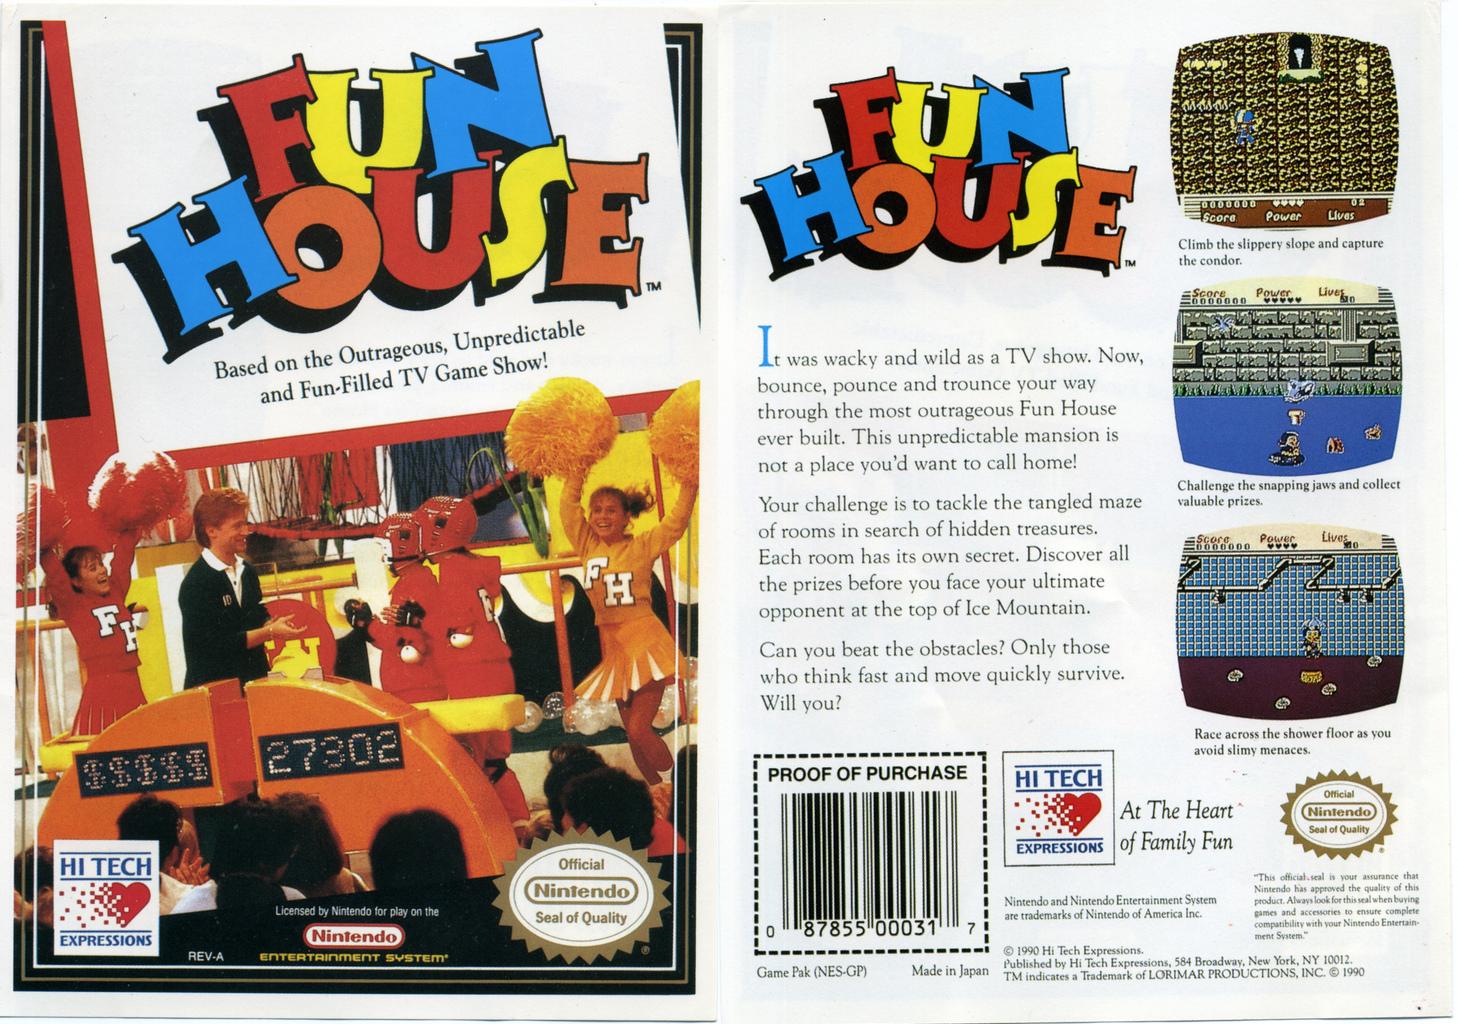 Fun House (NES Game; original unreleased version)